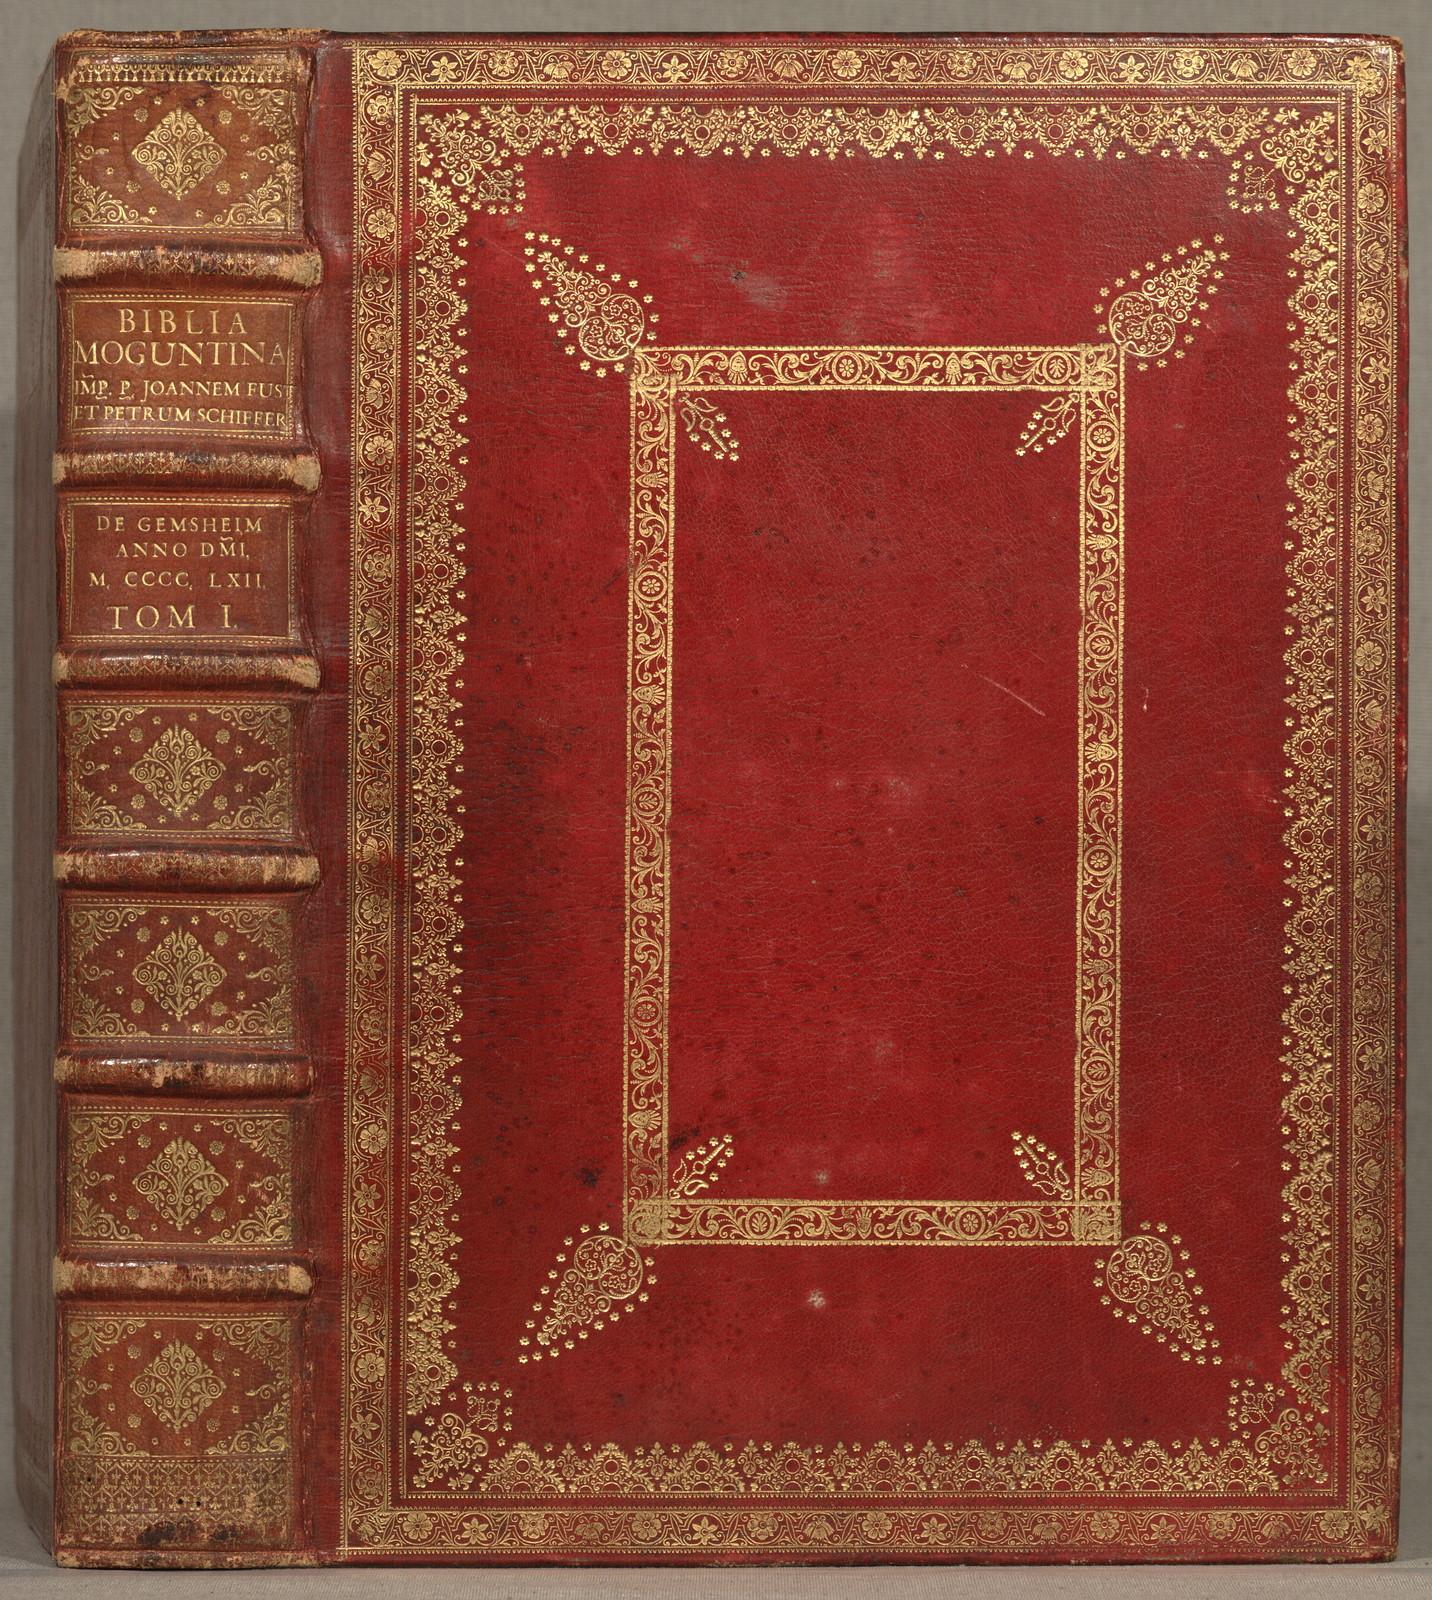 Mainz, Johann Fust and Peter Schoeffer, 14 Aug. (in vigilia Assumptionis Mariae) 1462.